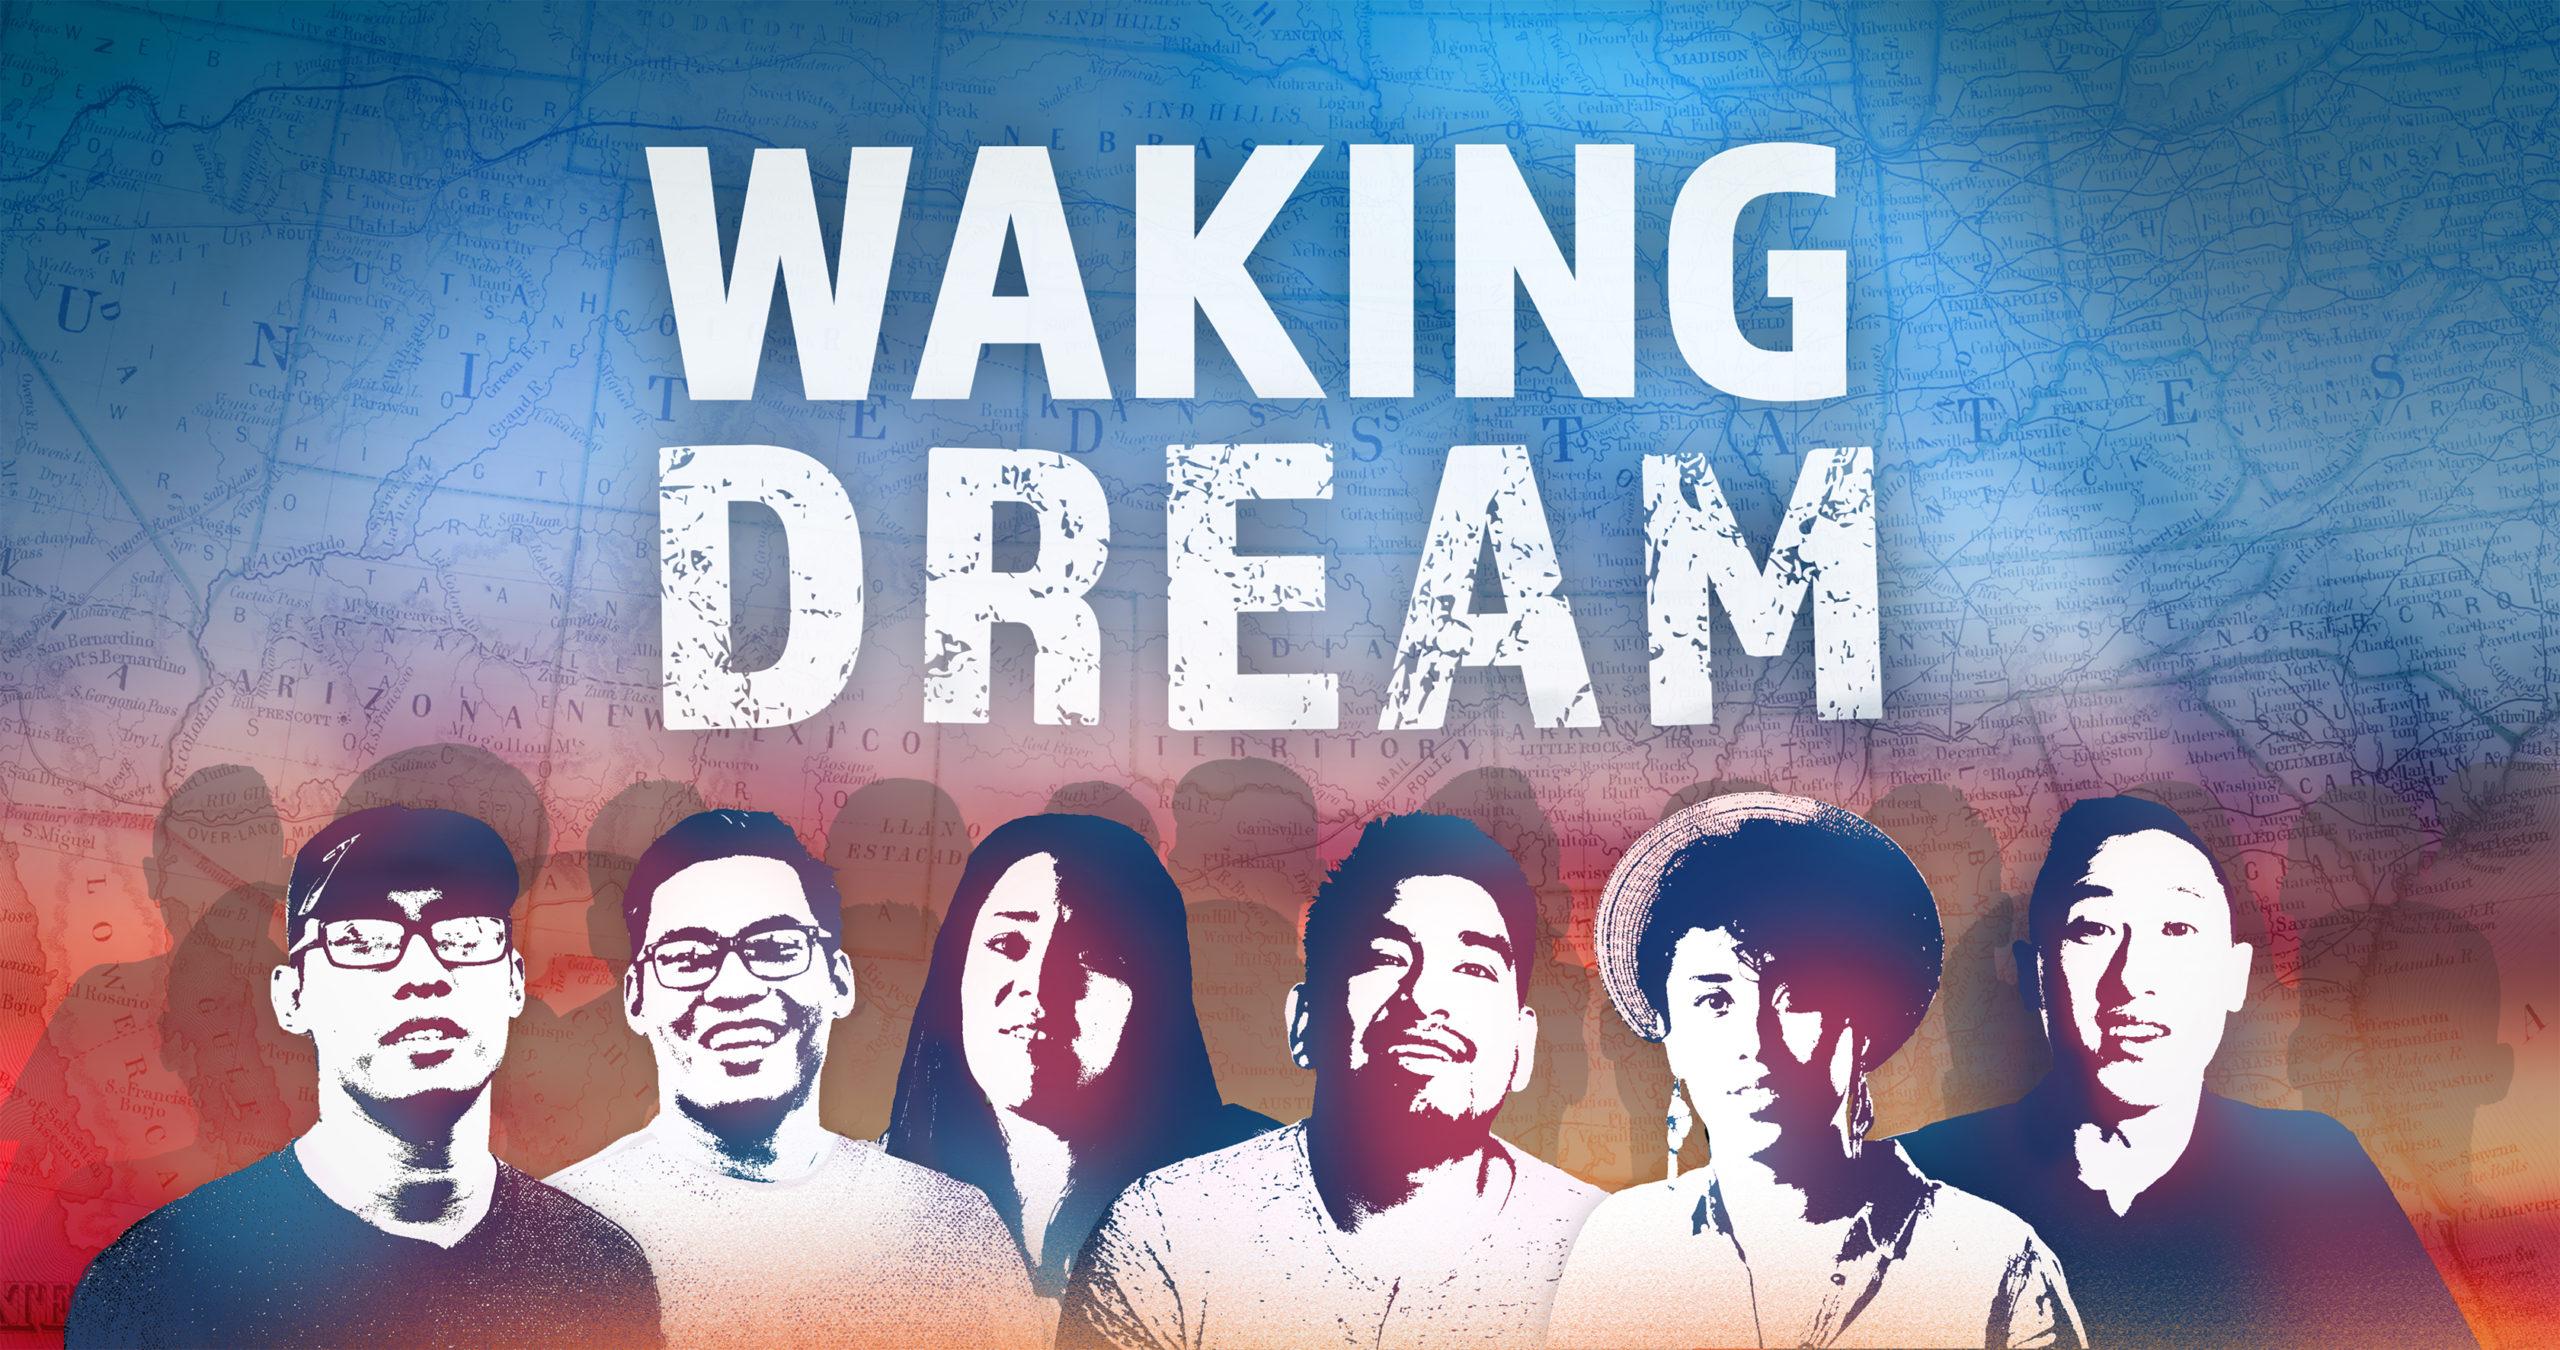 Waking Dream title screen